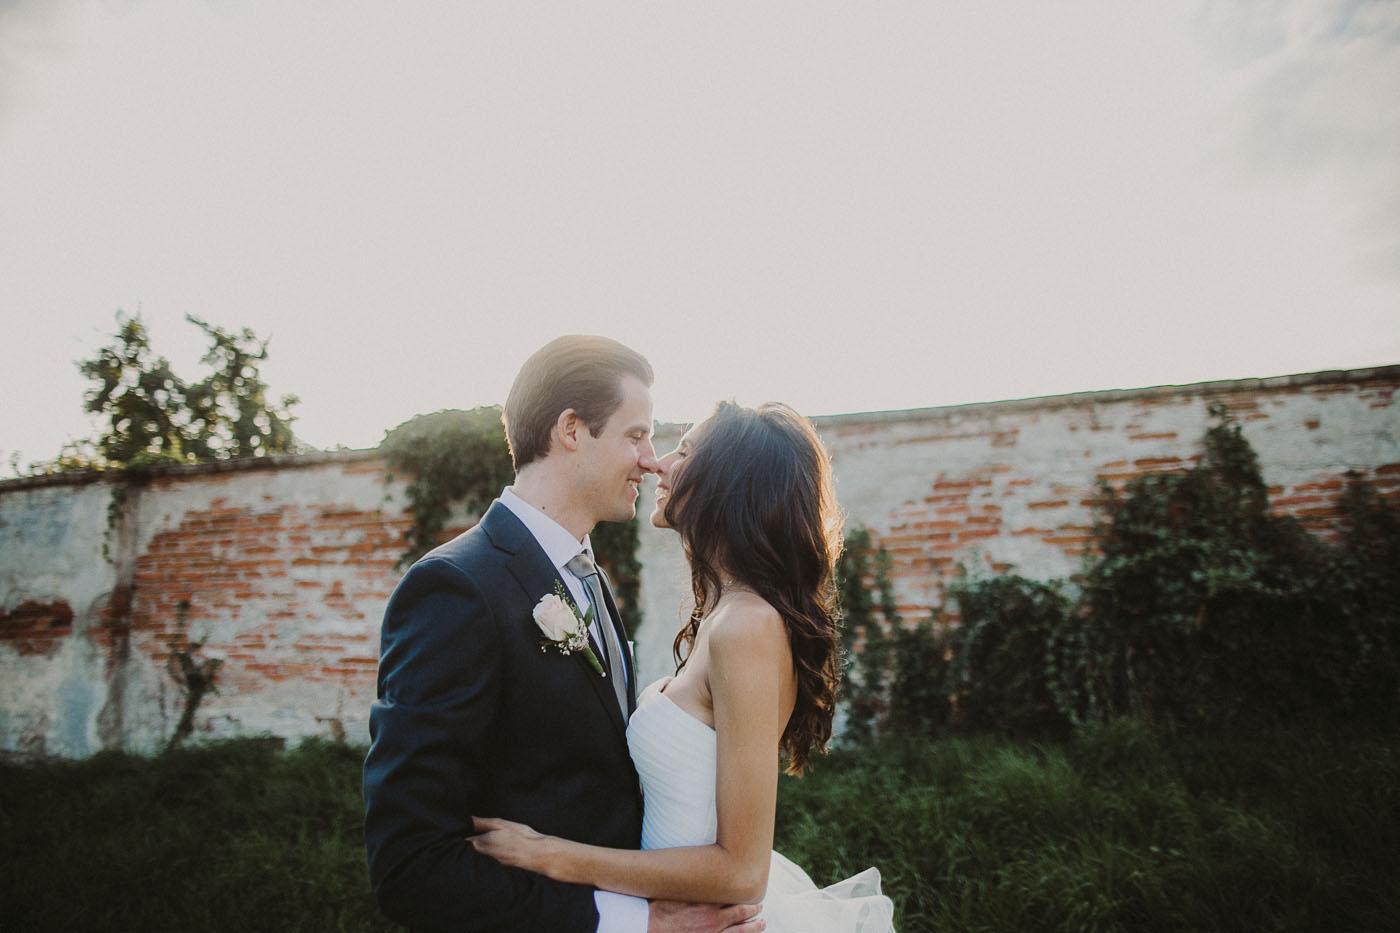 wedding-photographer-walpersdorf-austria-15